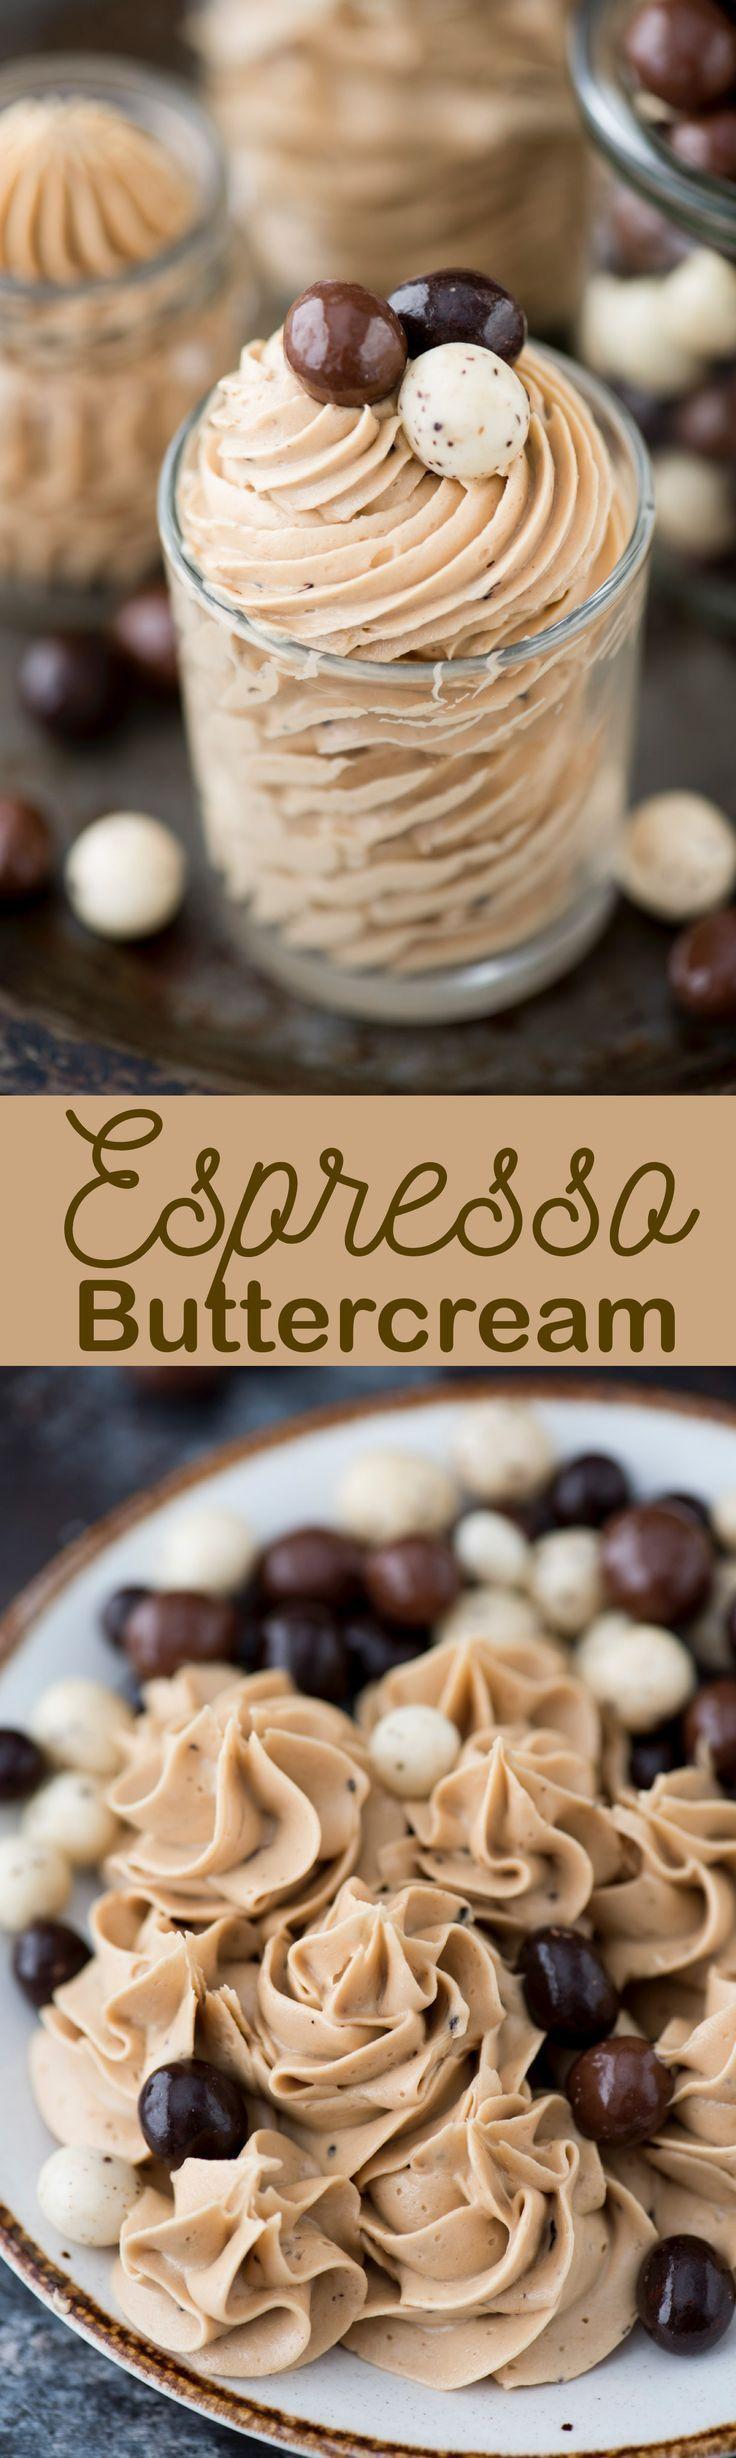 4 ingredient espresso buttercream recipe with instant